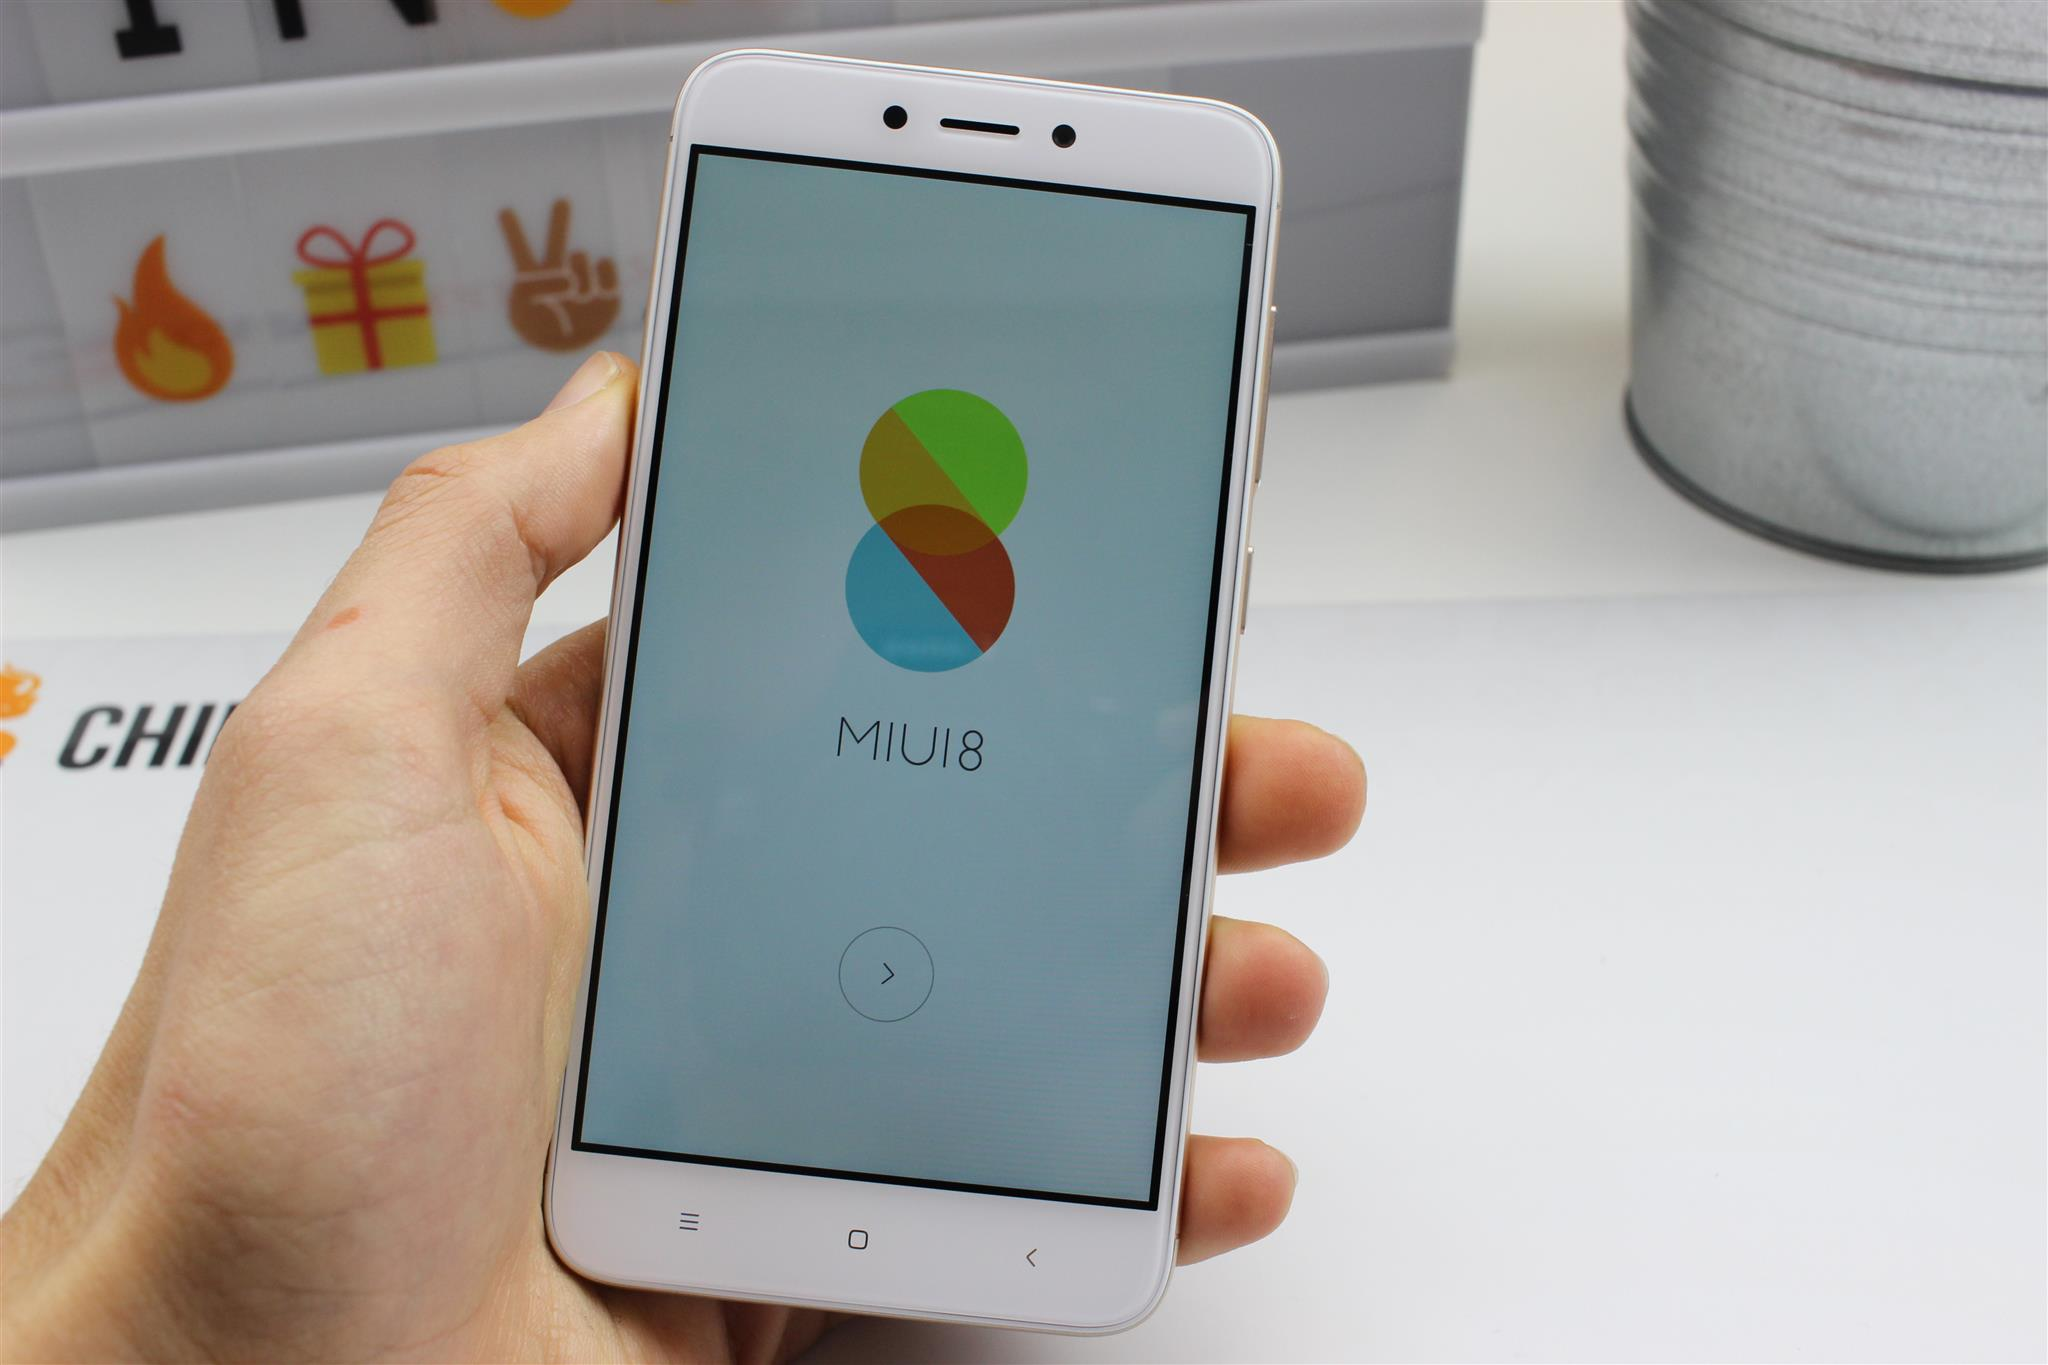 Xiaomi Redmi 4x Budget Smartphone Global Version Mit Lte Band 20 3s Pro 3 32 Gb Rom Gold